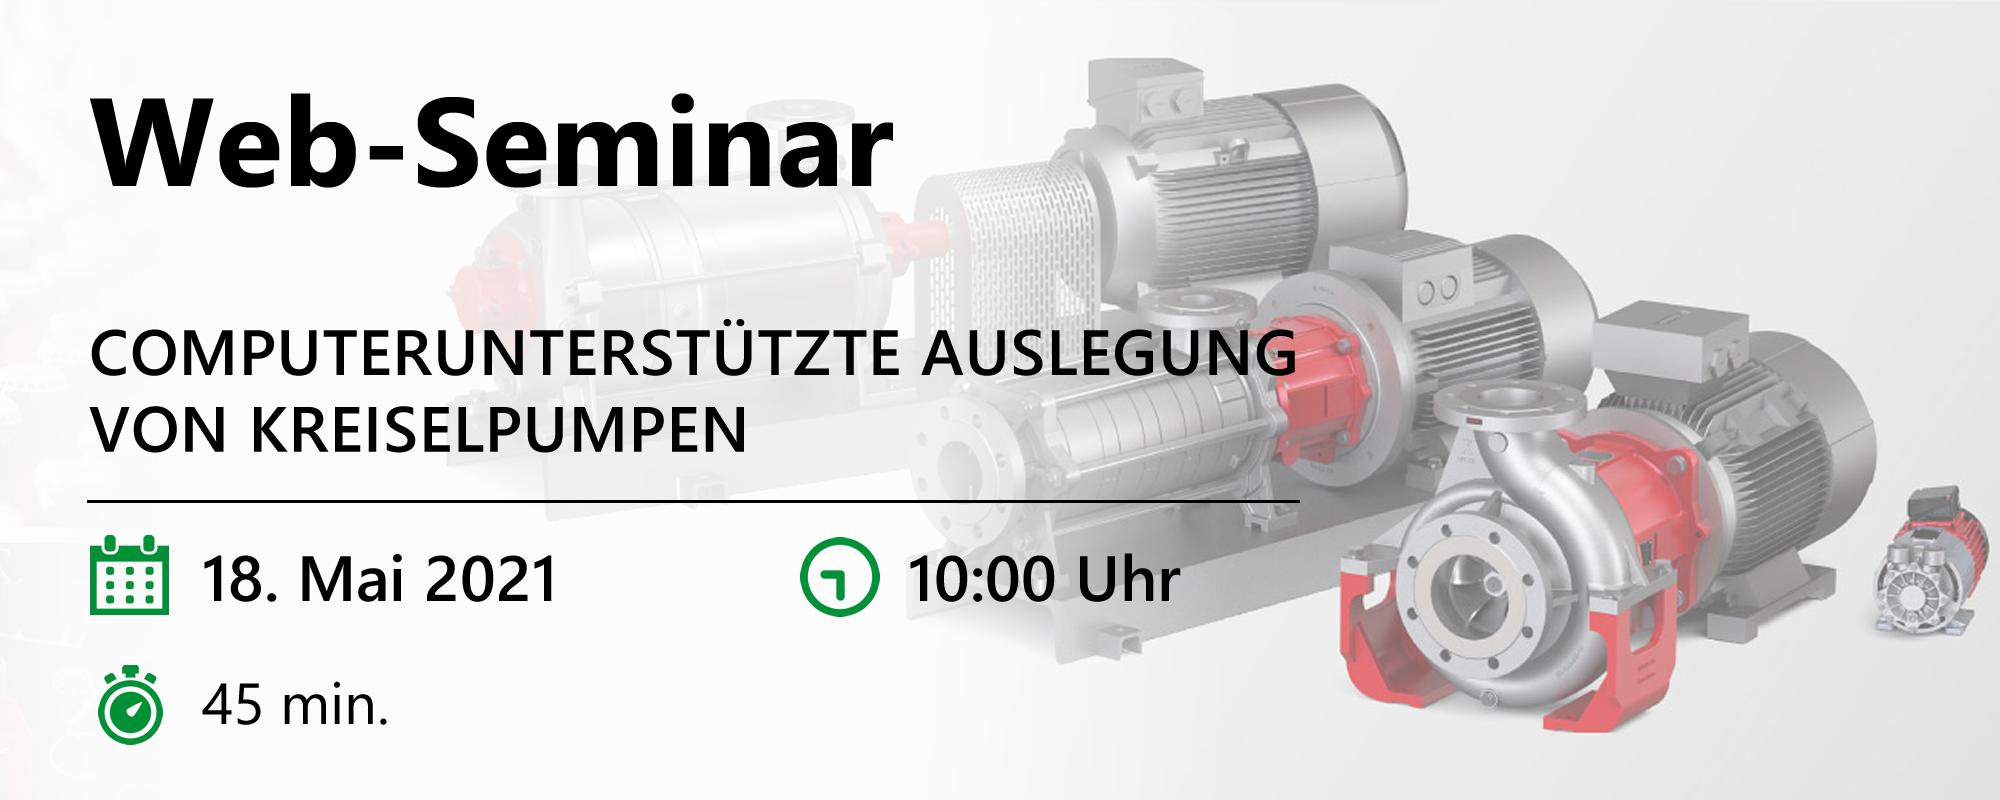 Web-Seminar am 18.05.21